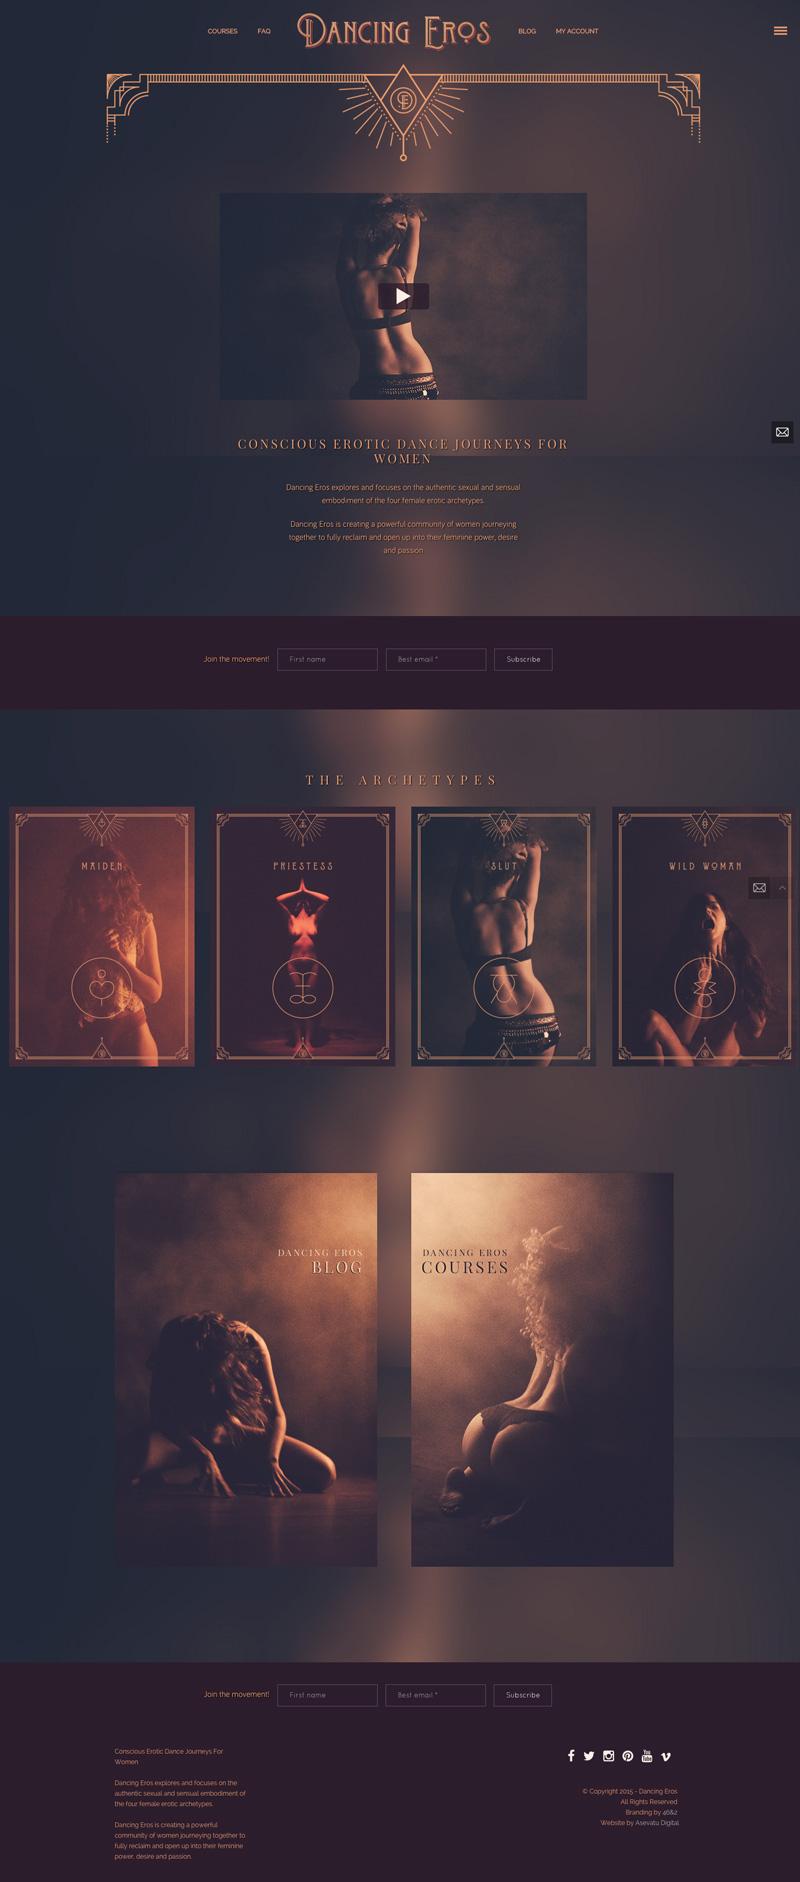 Dancing-Eros-__-Conscious-Erotic-Dance-Journeys-for_---https___dancingeros.com_